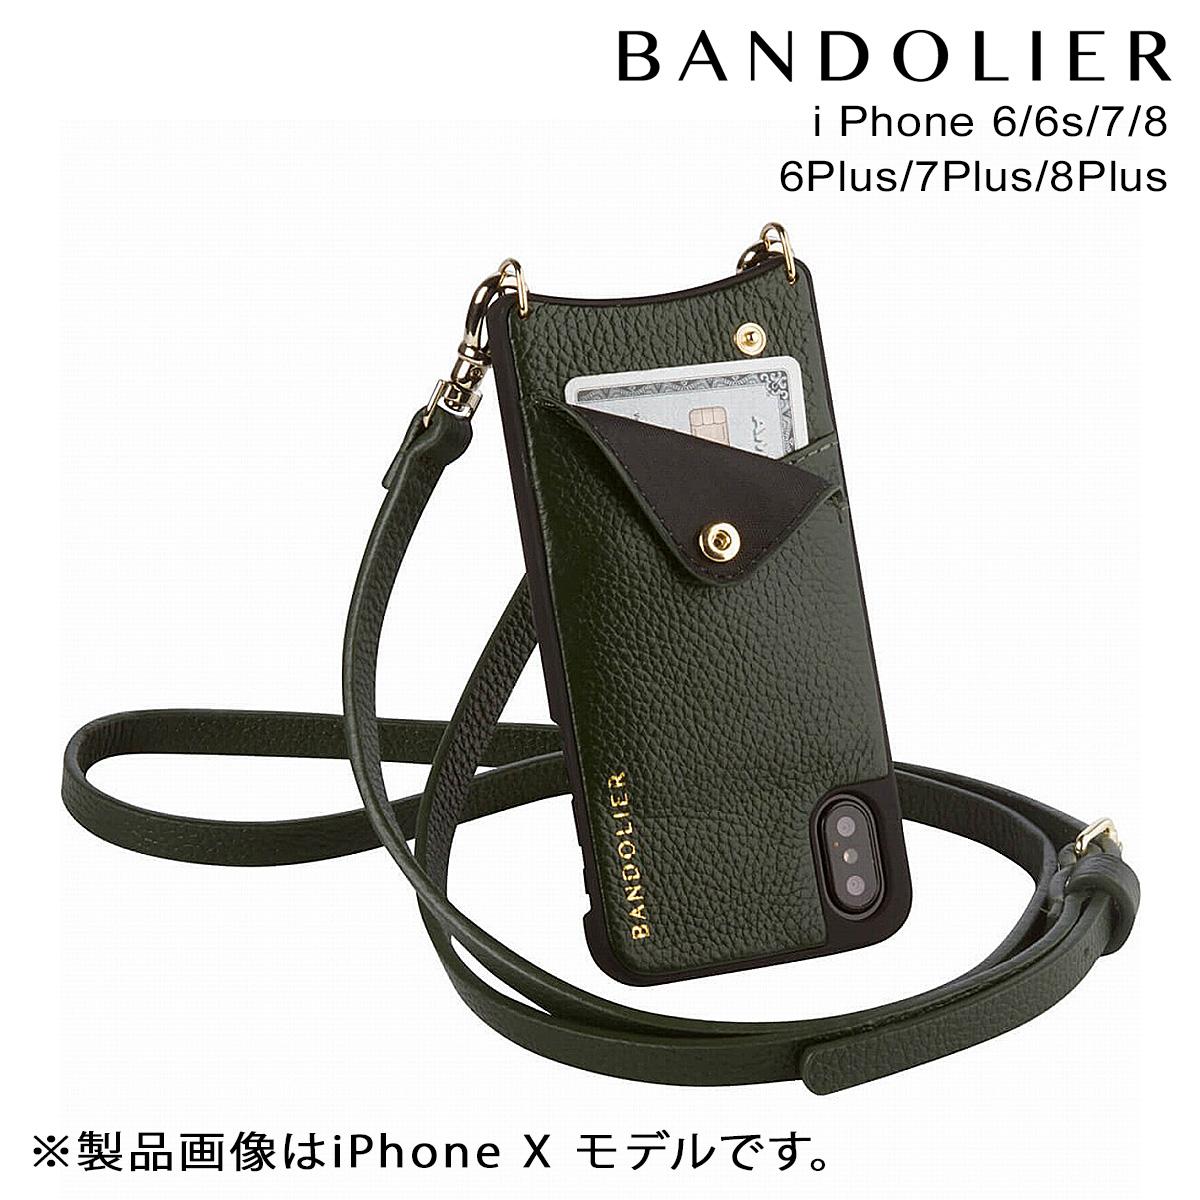 BANDOLIER EMMA EVERGREEN バンドリヤー iPhone8 iPhone7 7Plus 6s ケース スマホ アイフォン プラス メンズ レディース